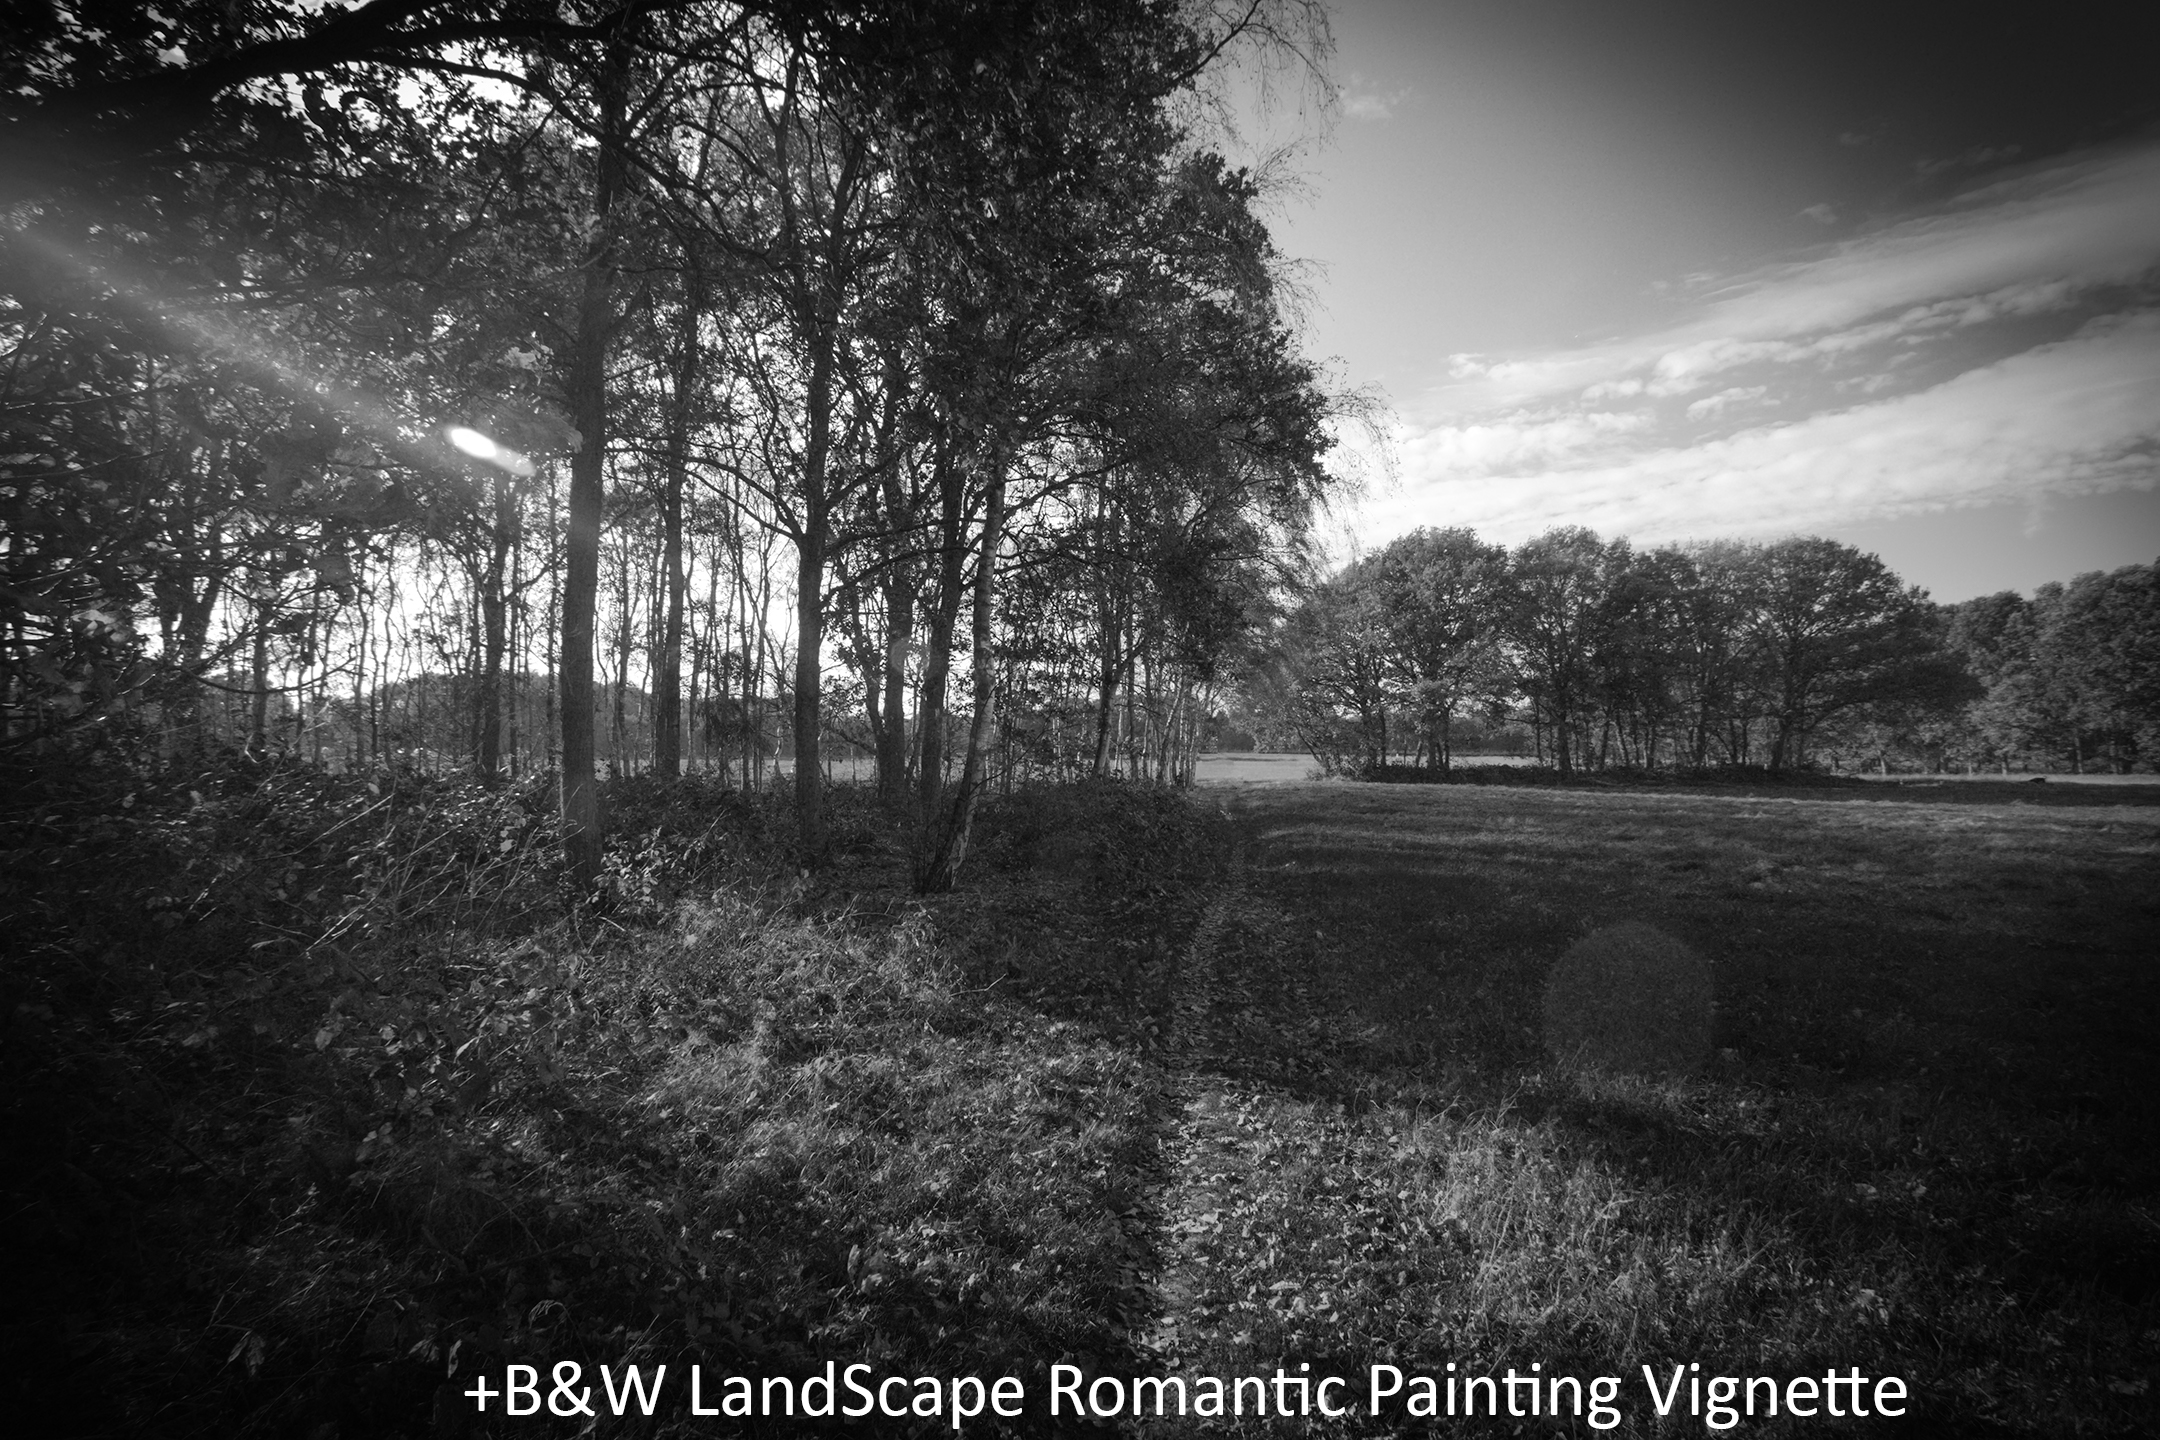 BW LandScape Romantic Painting Vignette.jpg